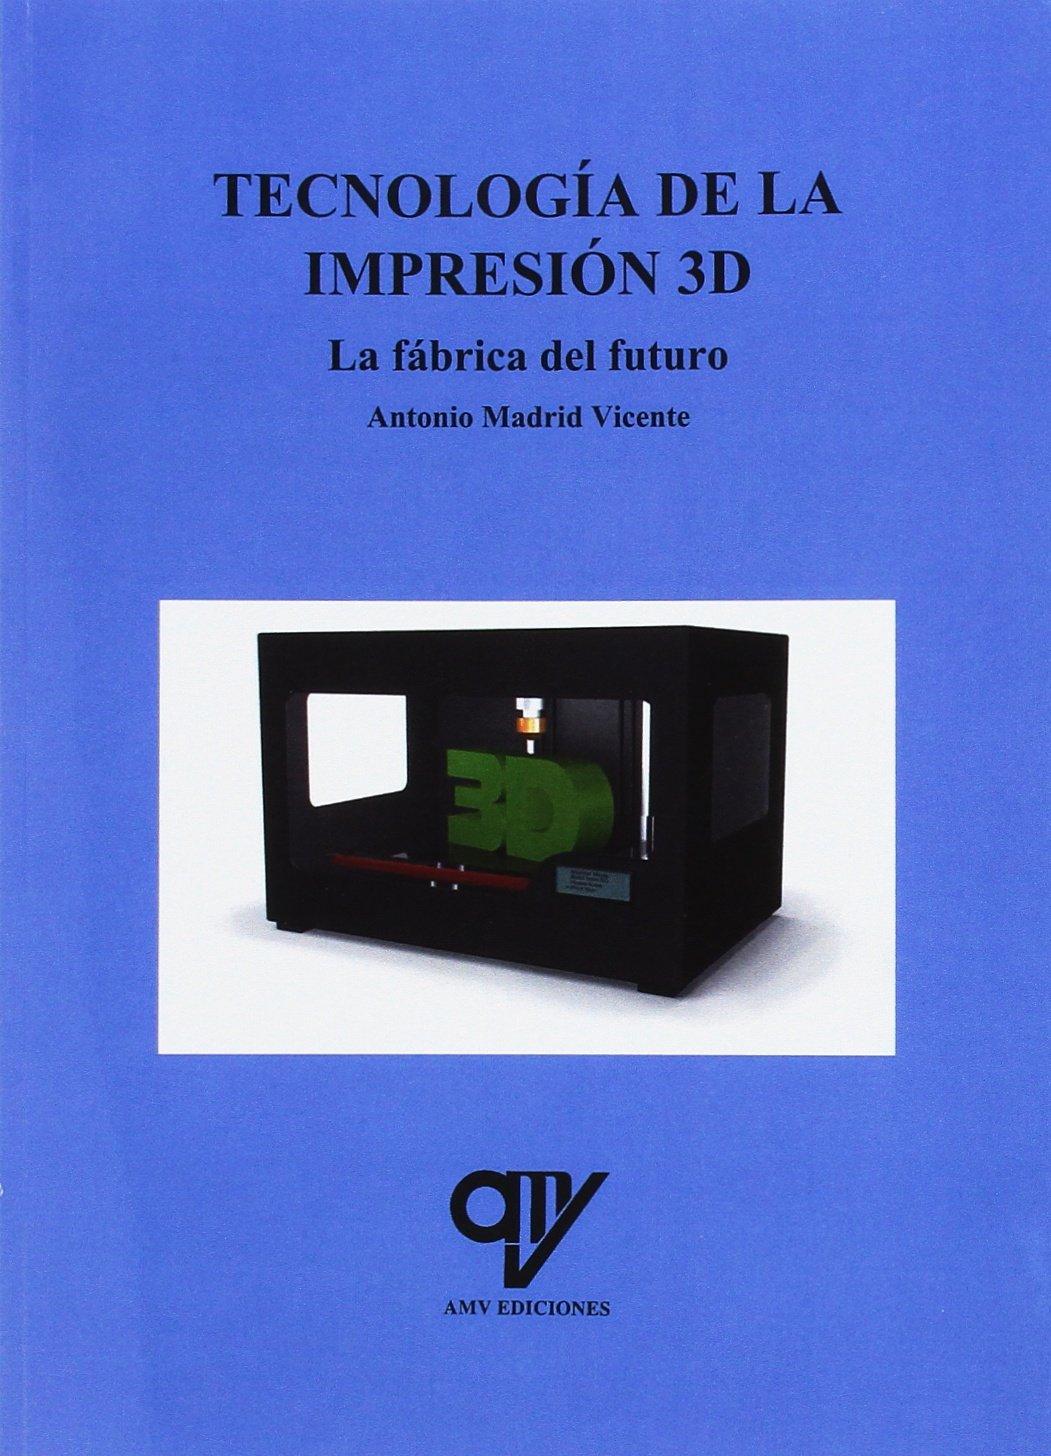 TECNOLOGIA DE LA IMPRESION 3D: Antonio Madrid Vicente ...